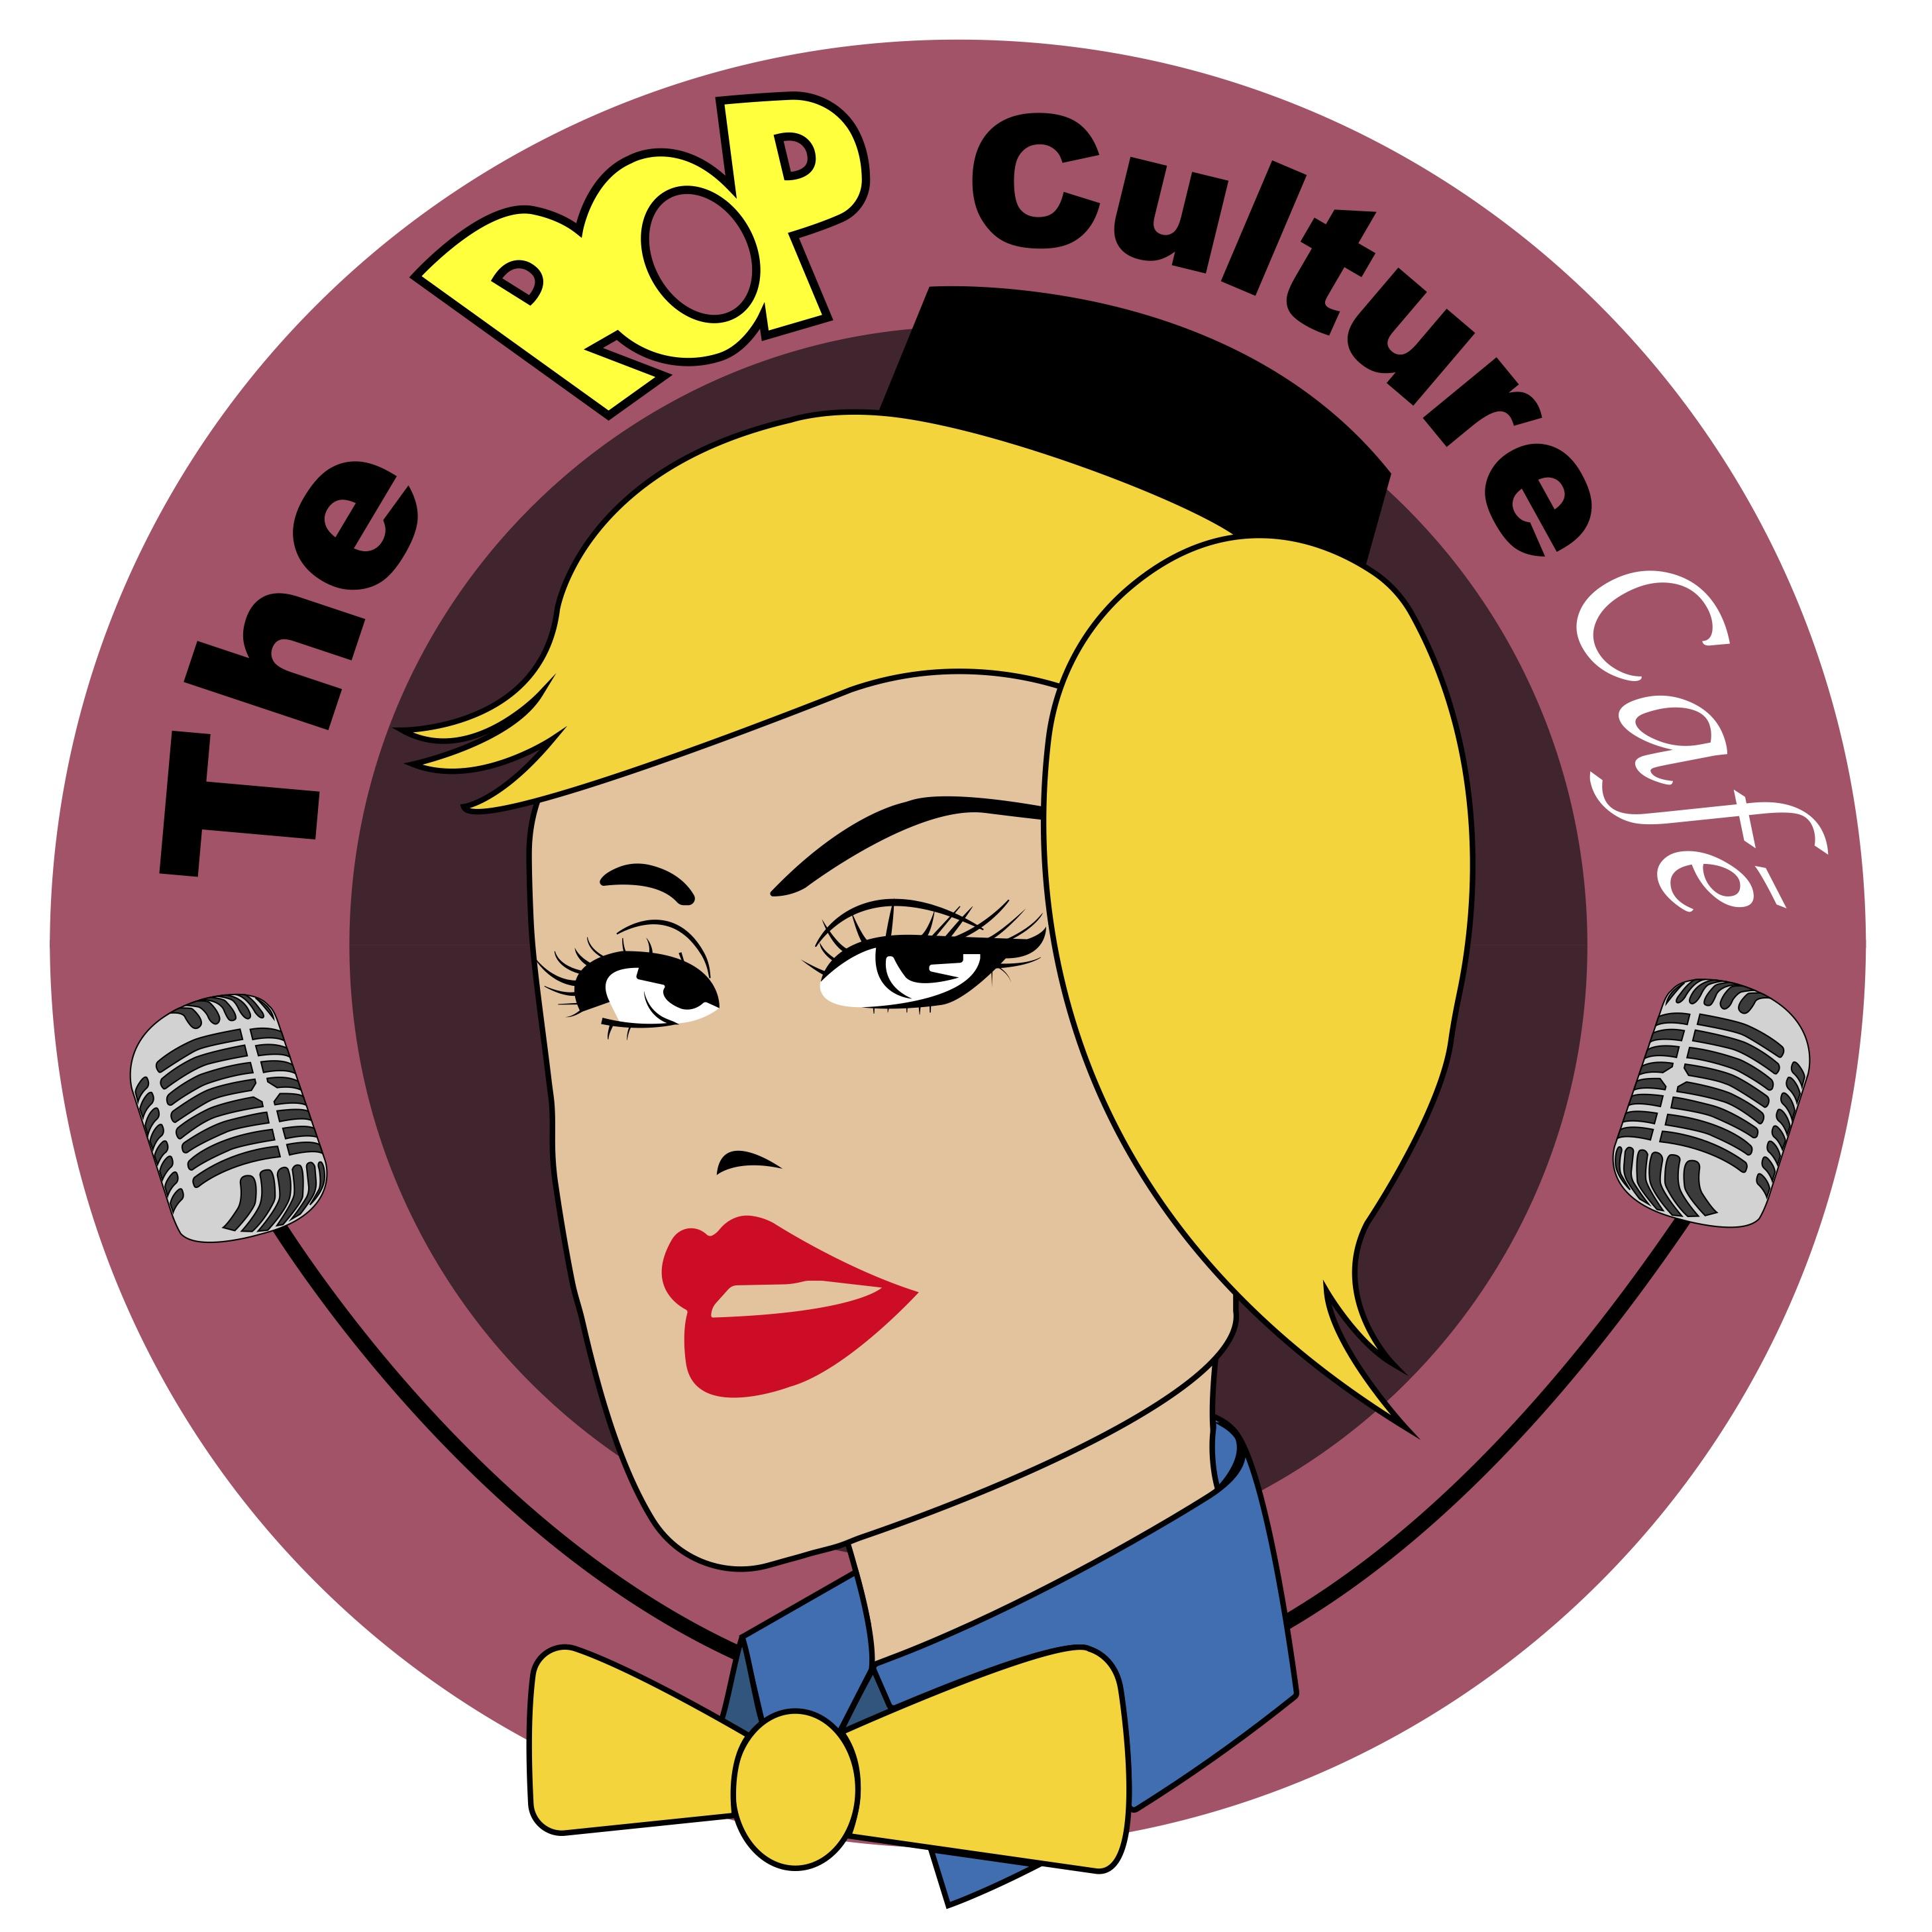 The Pop Culture Cafe show art